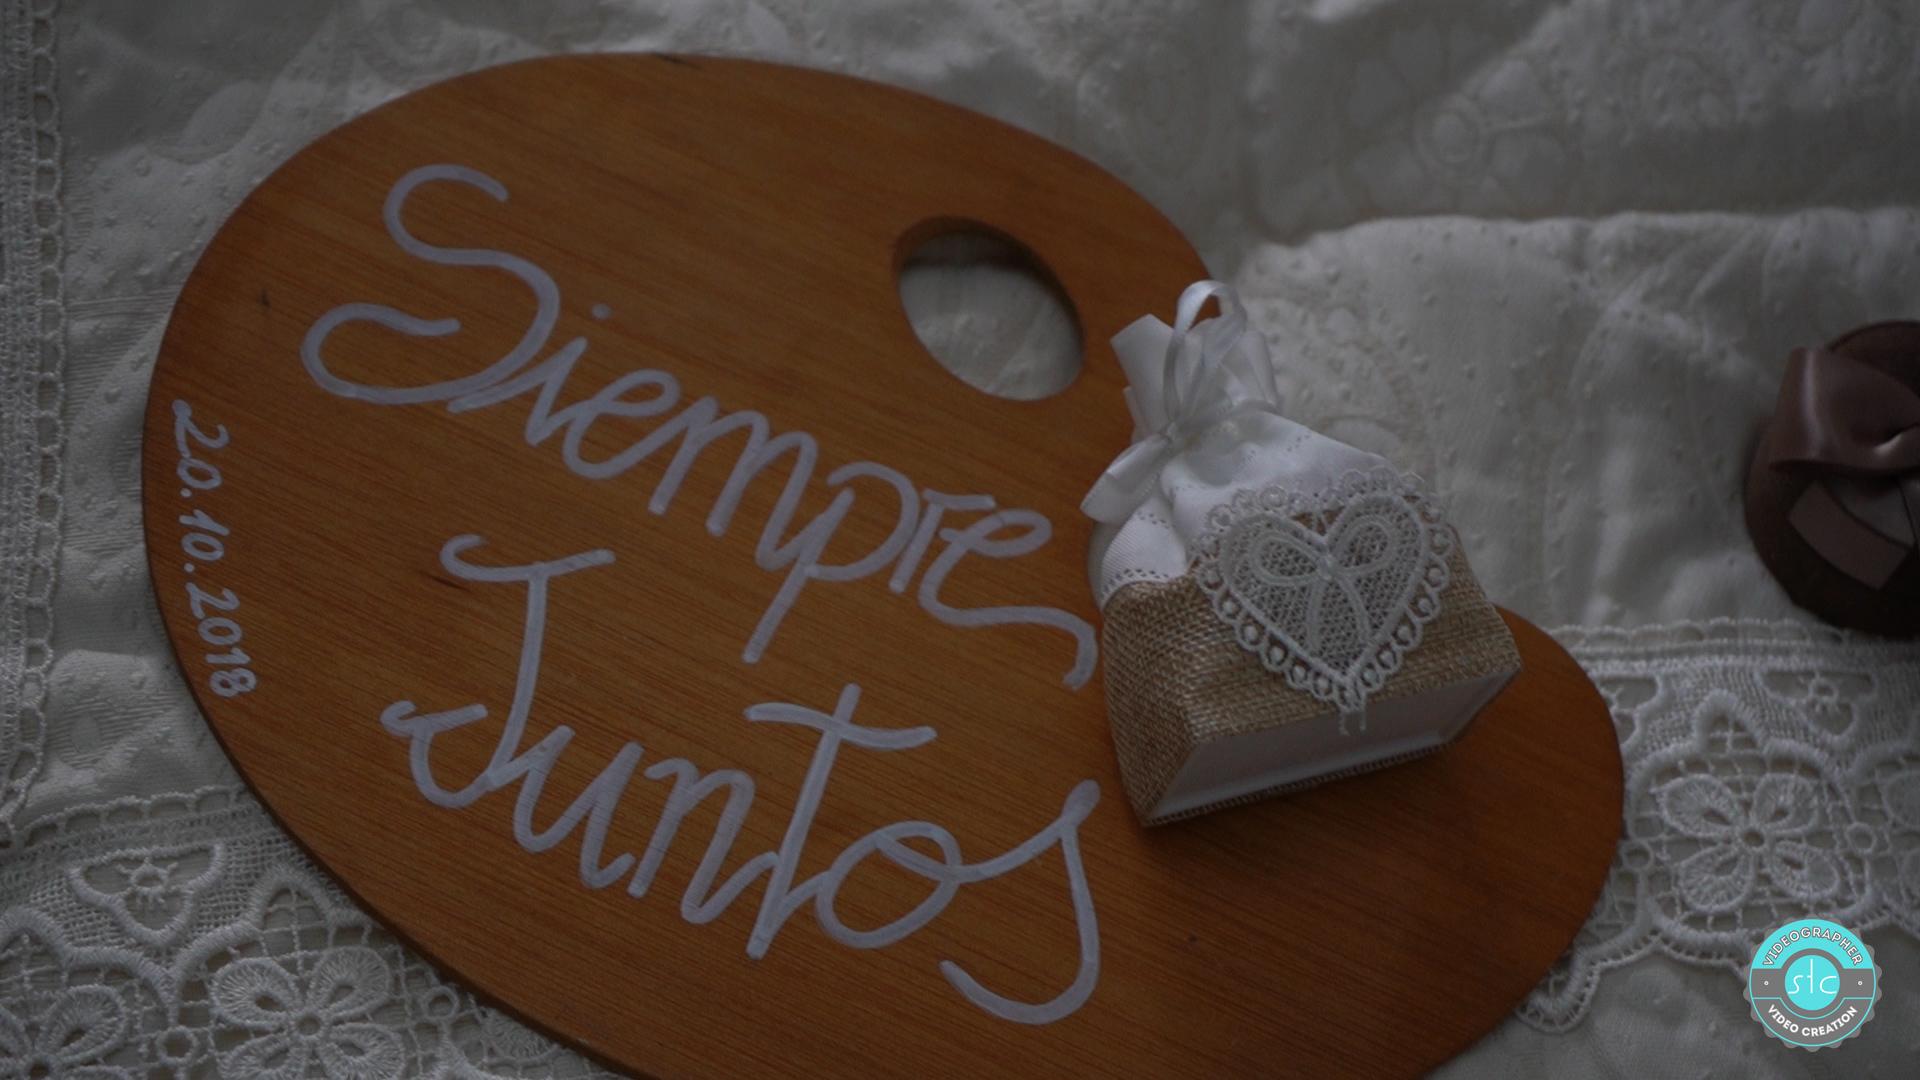 aqui-llega-la-novia-cartel-siempre-juntos-stc-videographer